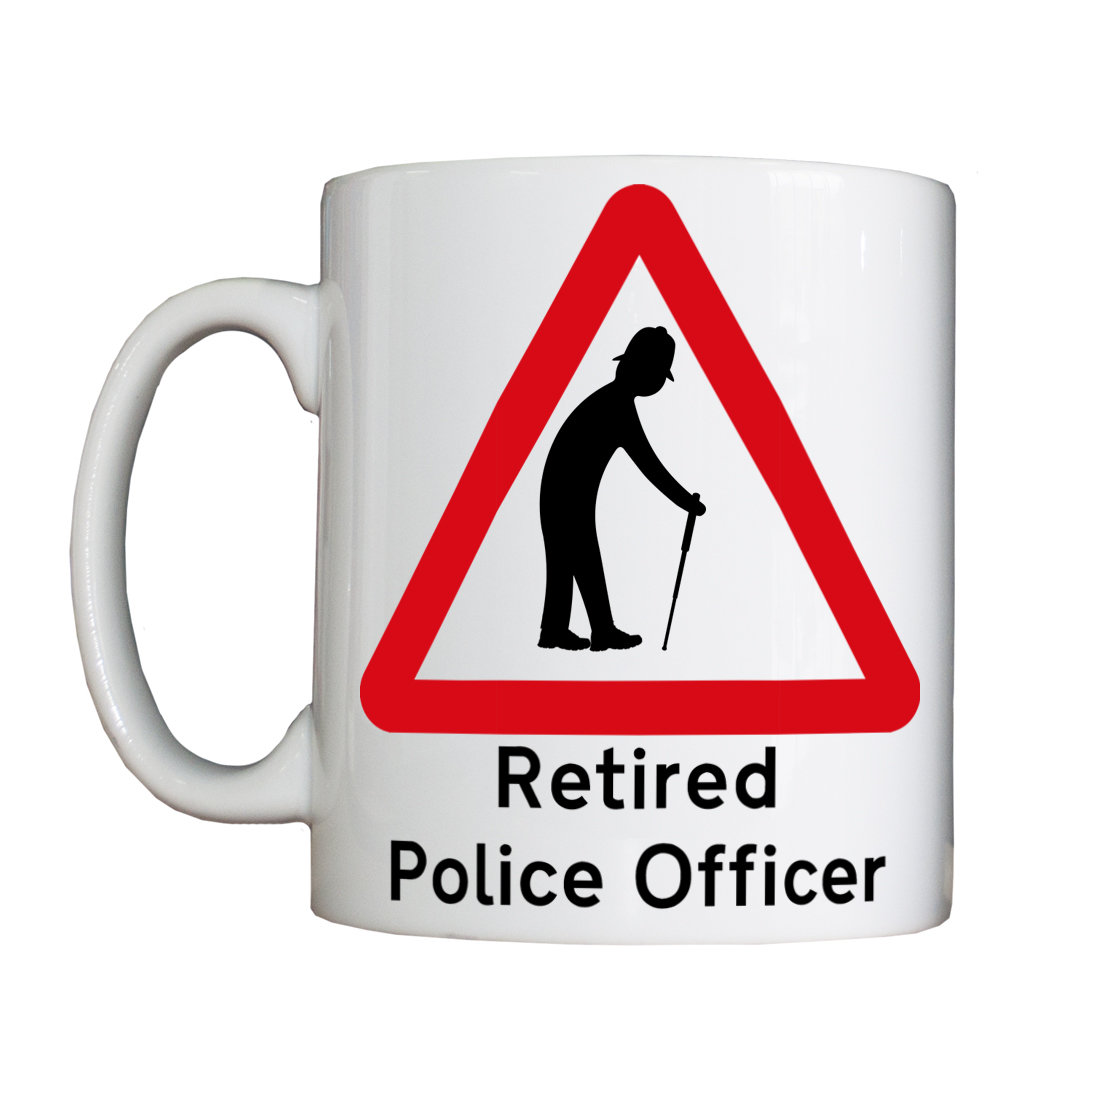 New Personalised 'Retired Police Officer' Mug NewRetiredMug